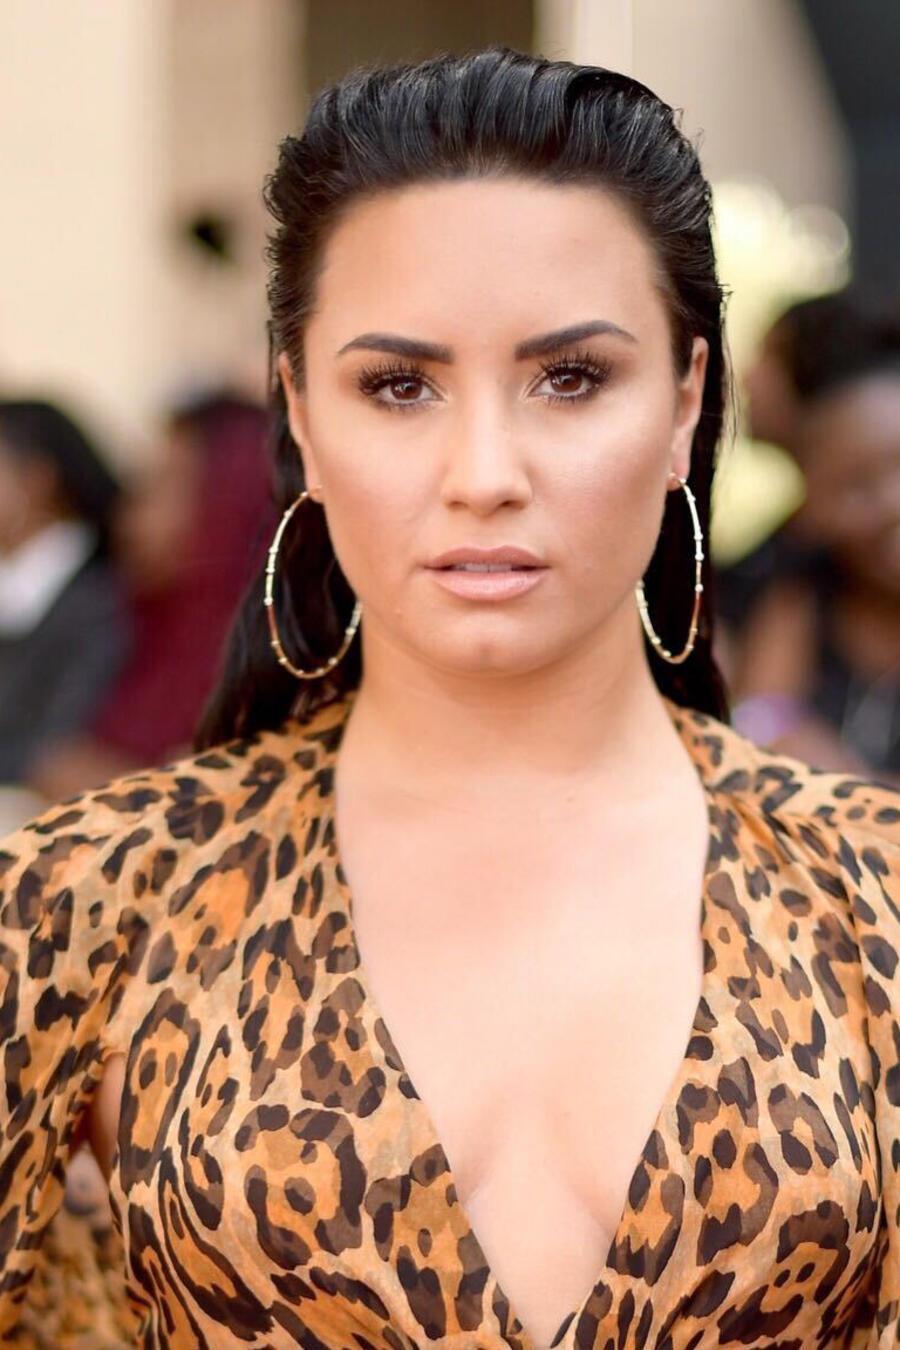 Demi Lovato, Eva Longoria, Luis Fonsi and More Latinx Stars React to George Floyd's Death